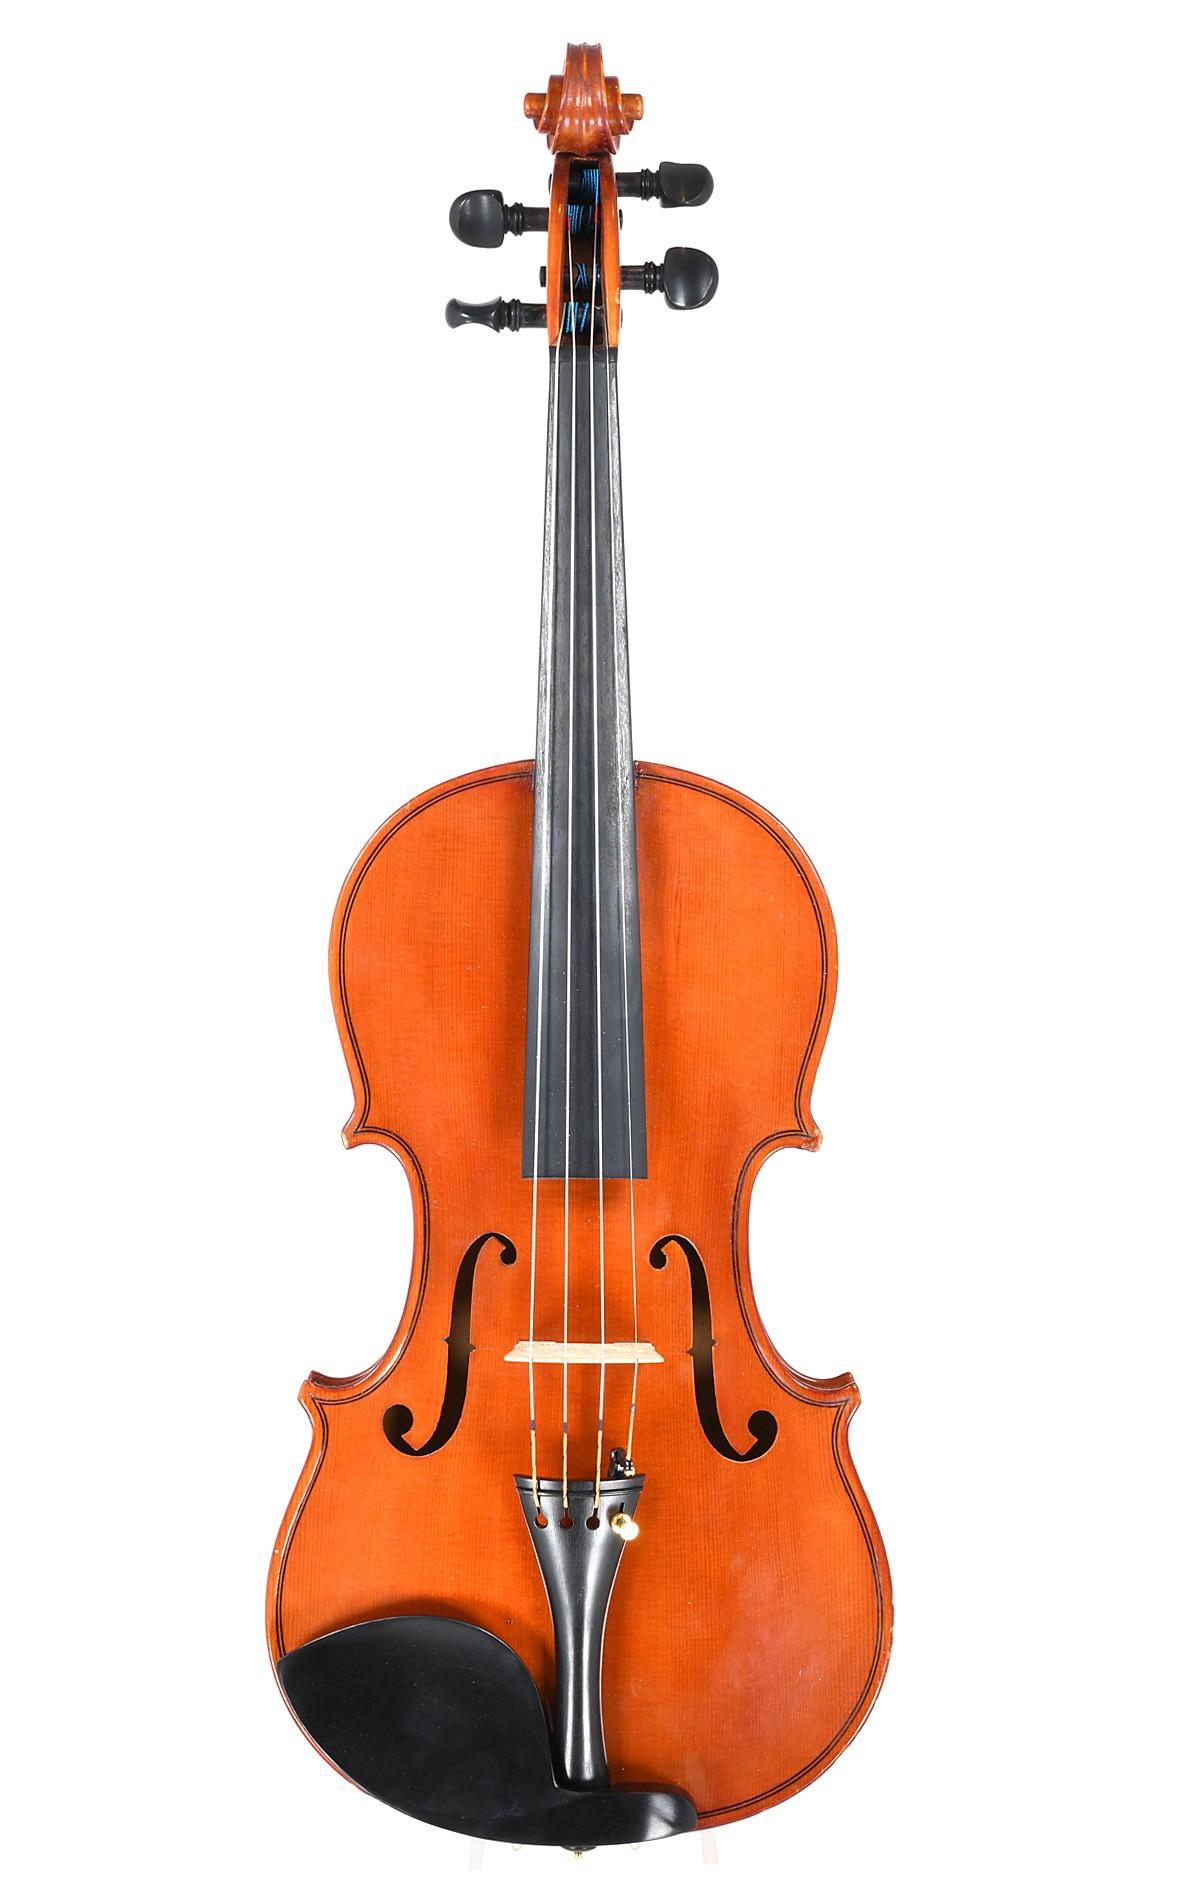 Certified Italian violin by Luigi Mozzani